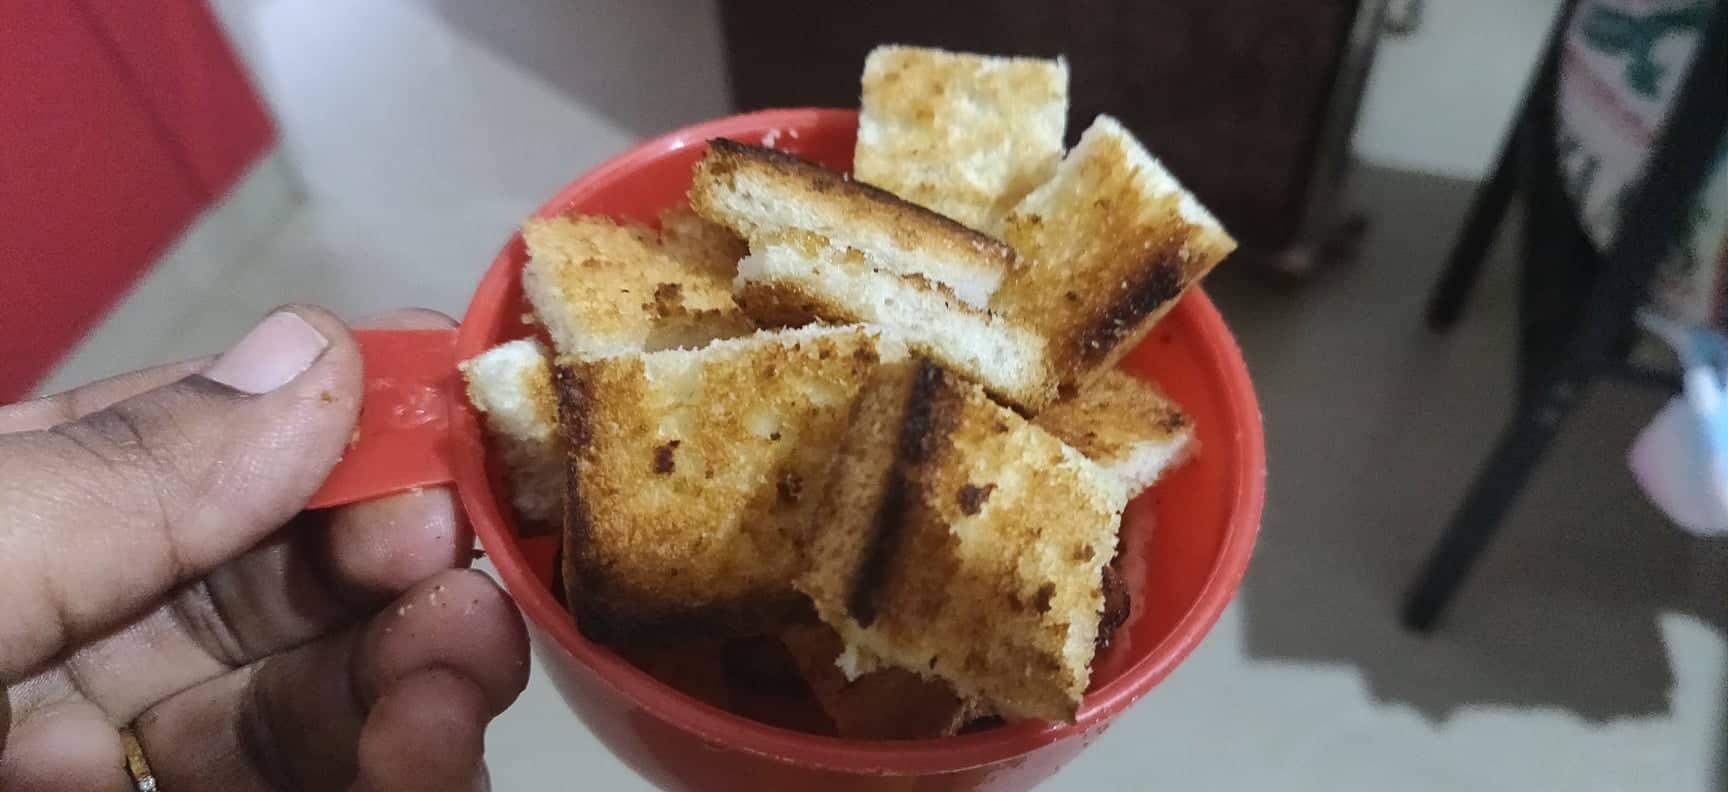 tomato_soup - bread croutons